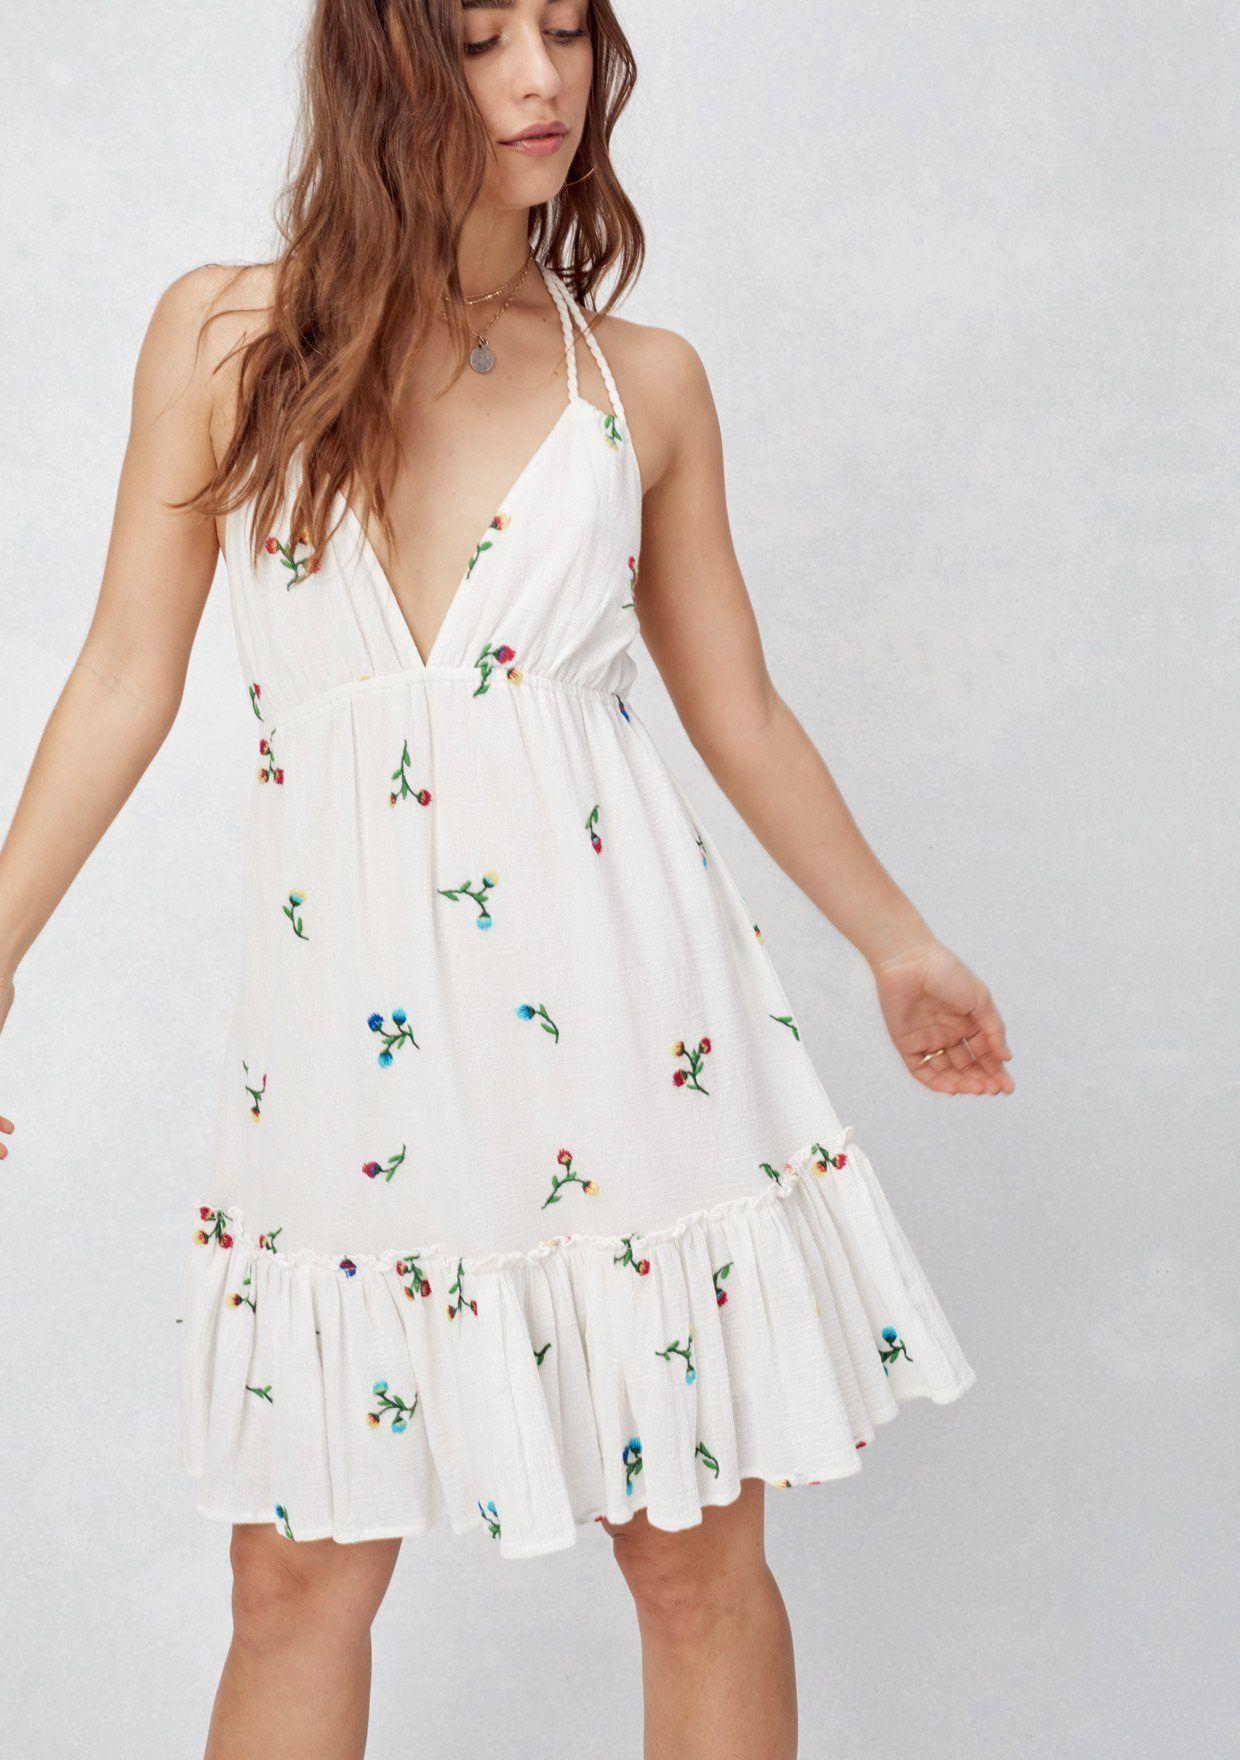 Liliya Mini Dress Lovestitch In 2021 Cotton Dress Summer Casual Dresses For Teens White Cotton Summer Dress [ 1760 x 1240 Pixel ]